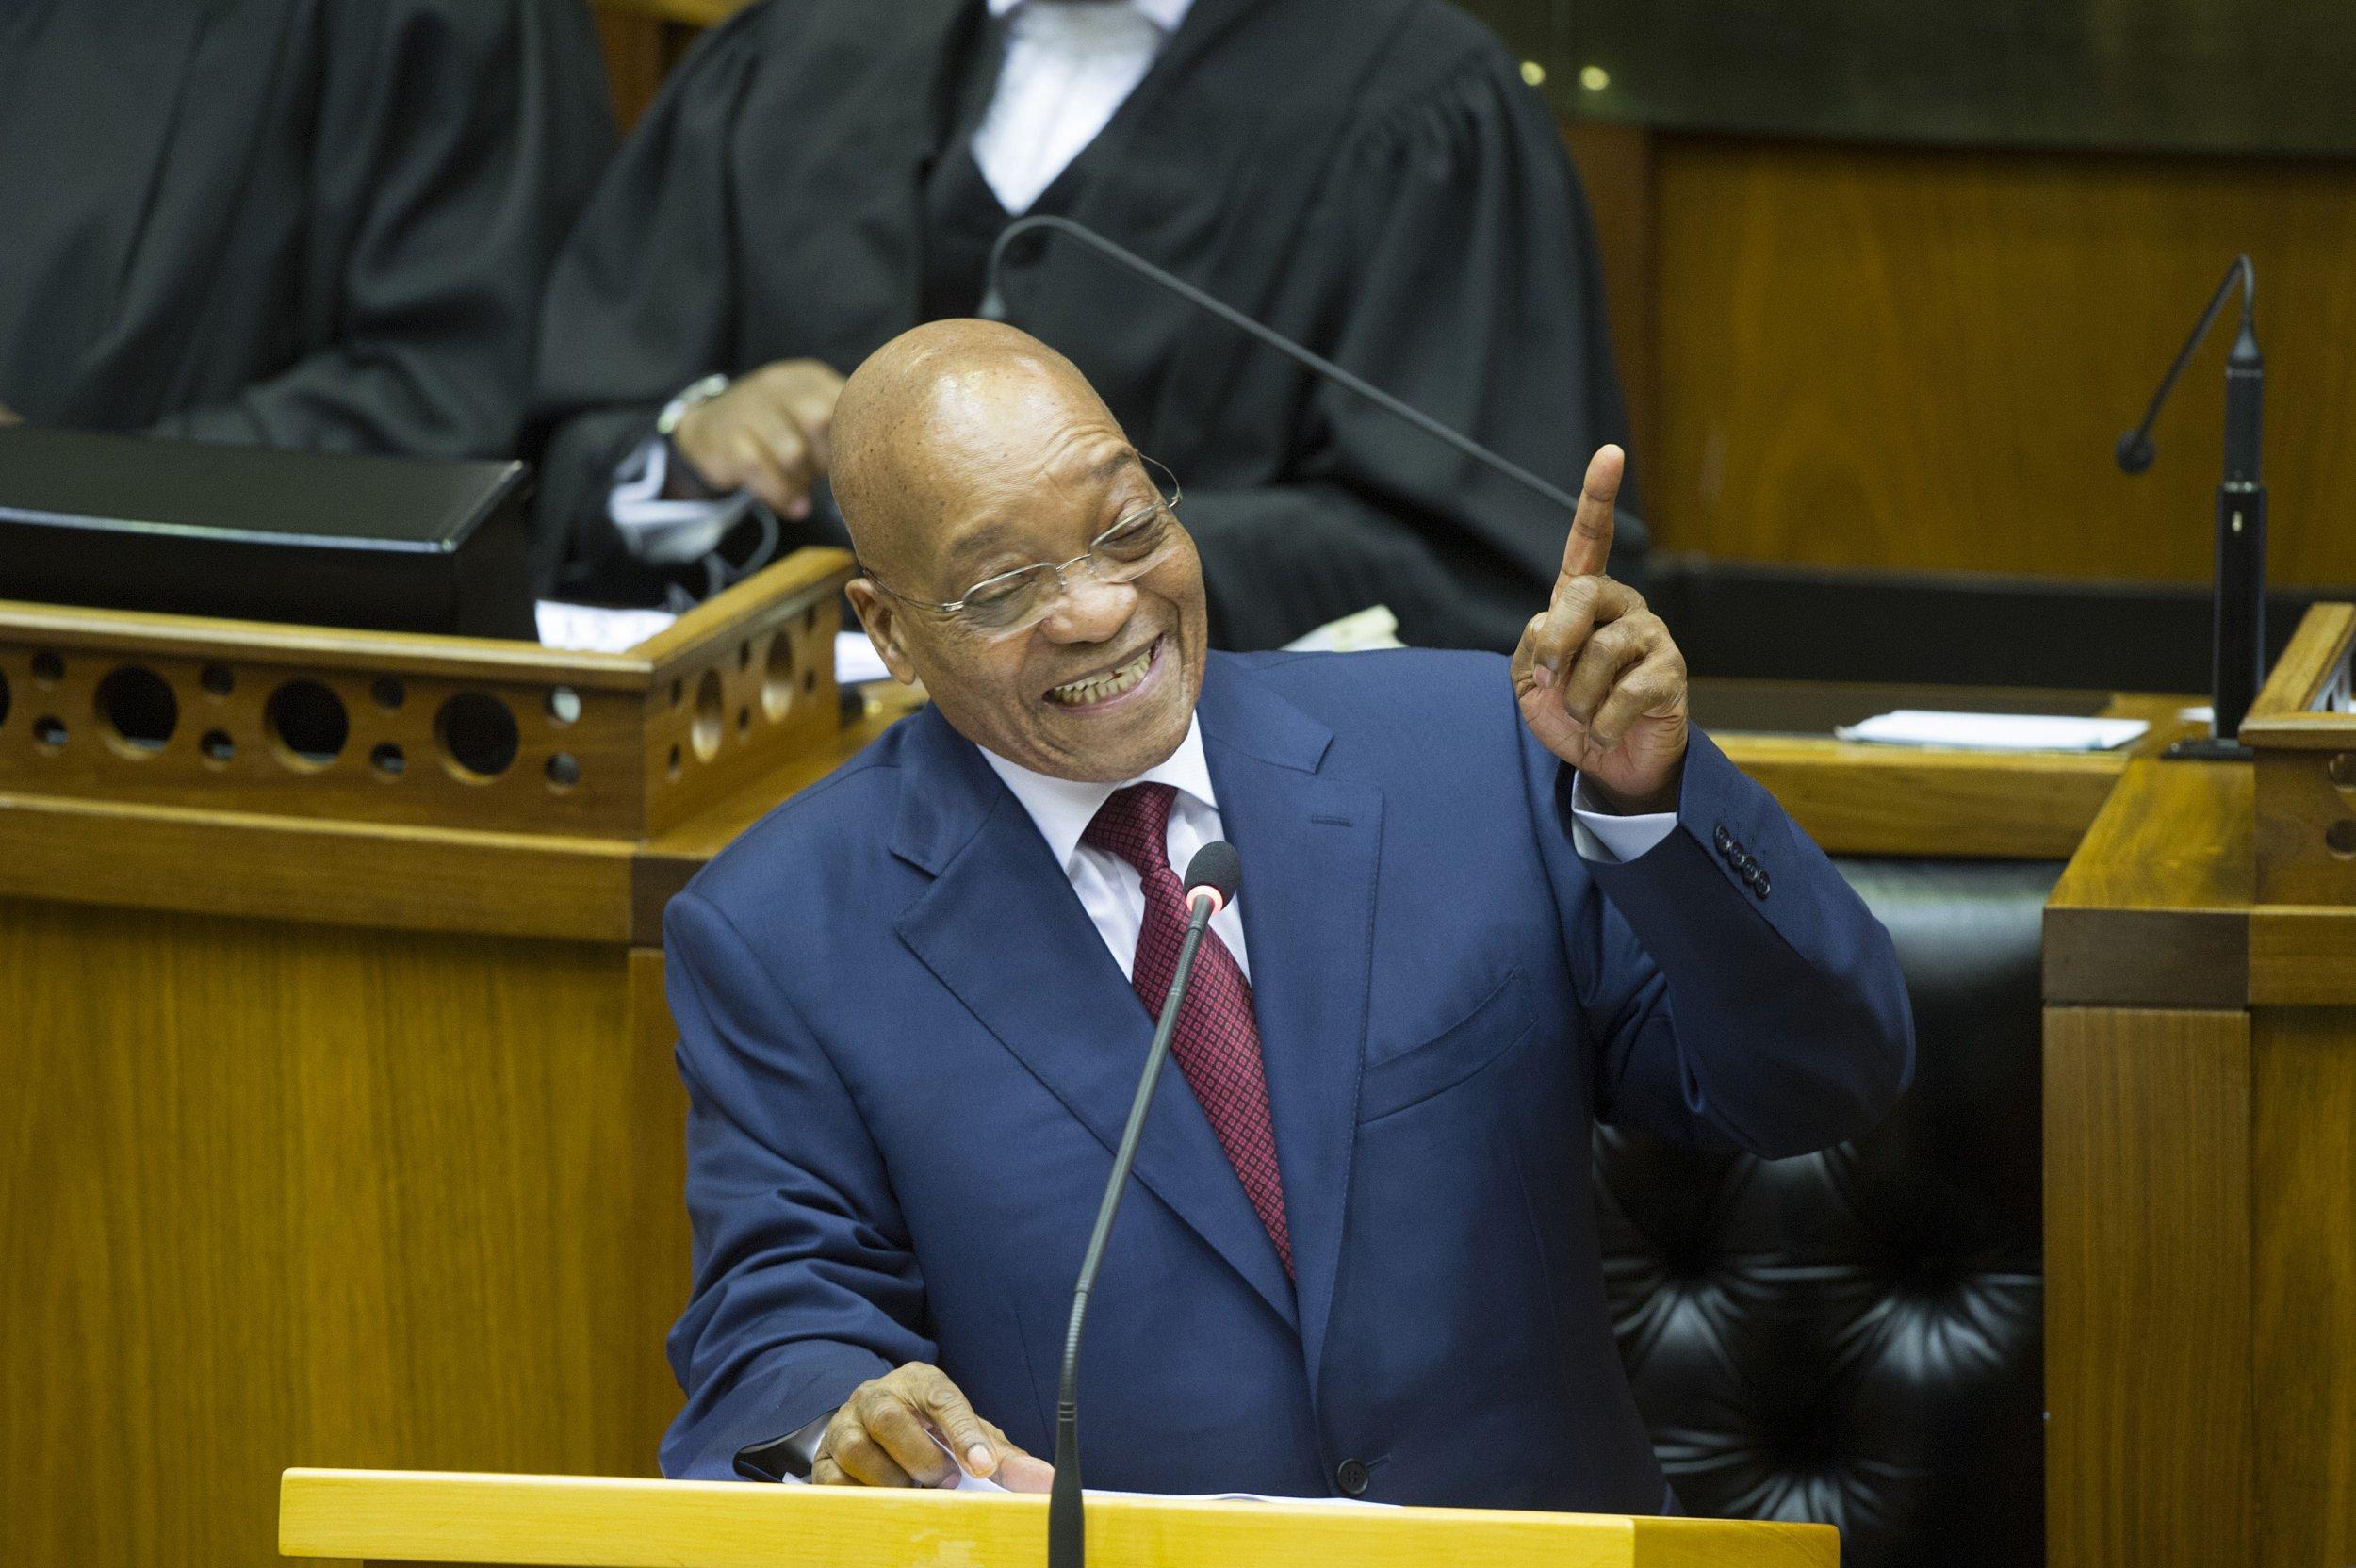 Jacob Zuma parliament